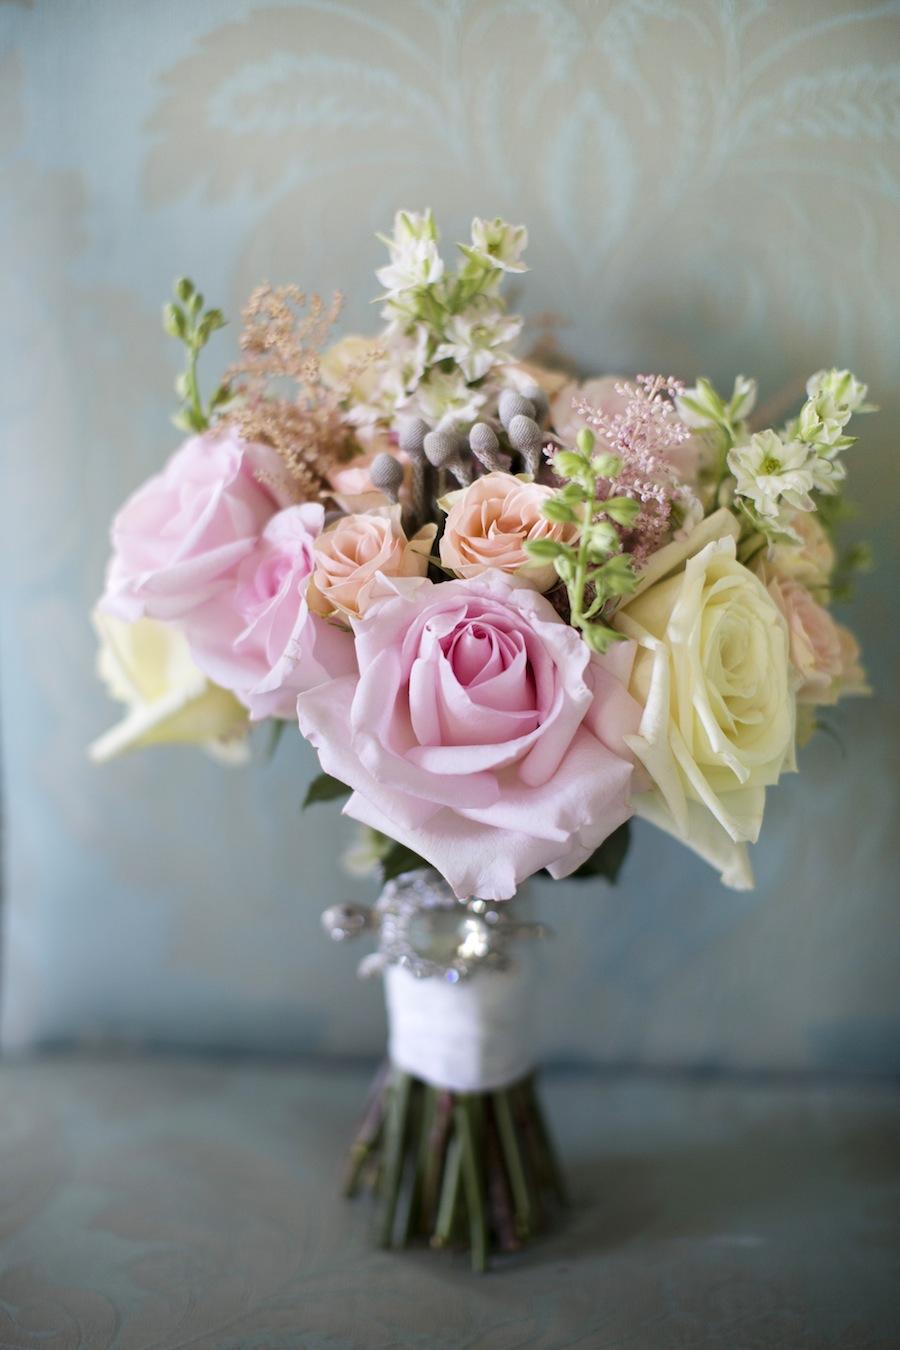 Pastel Pink and Peach Rose Wedding Bouquet | Tampa Wedding Florist Florist Fire